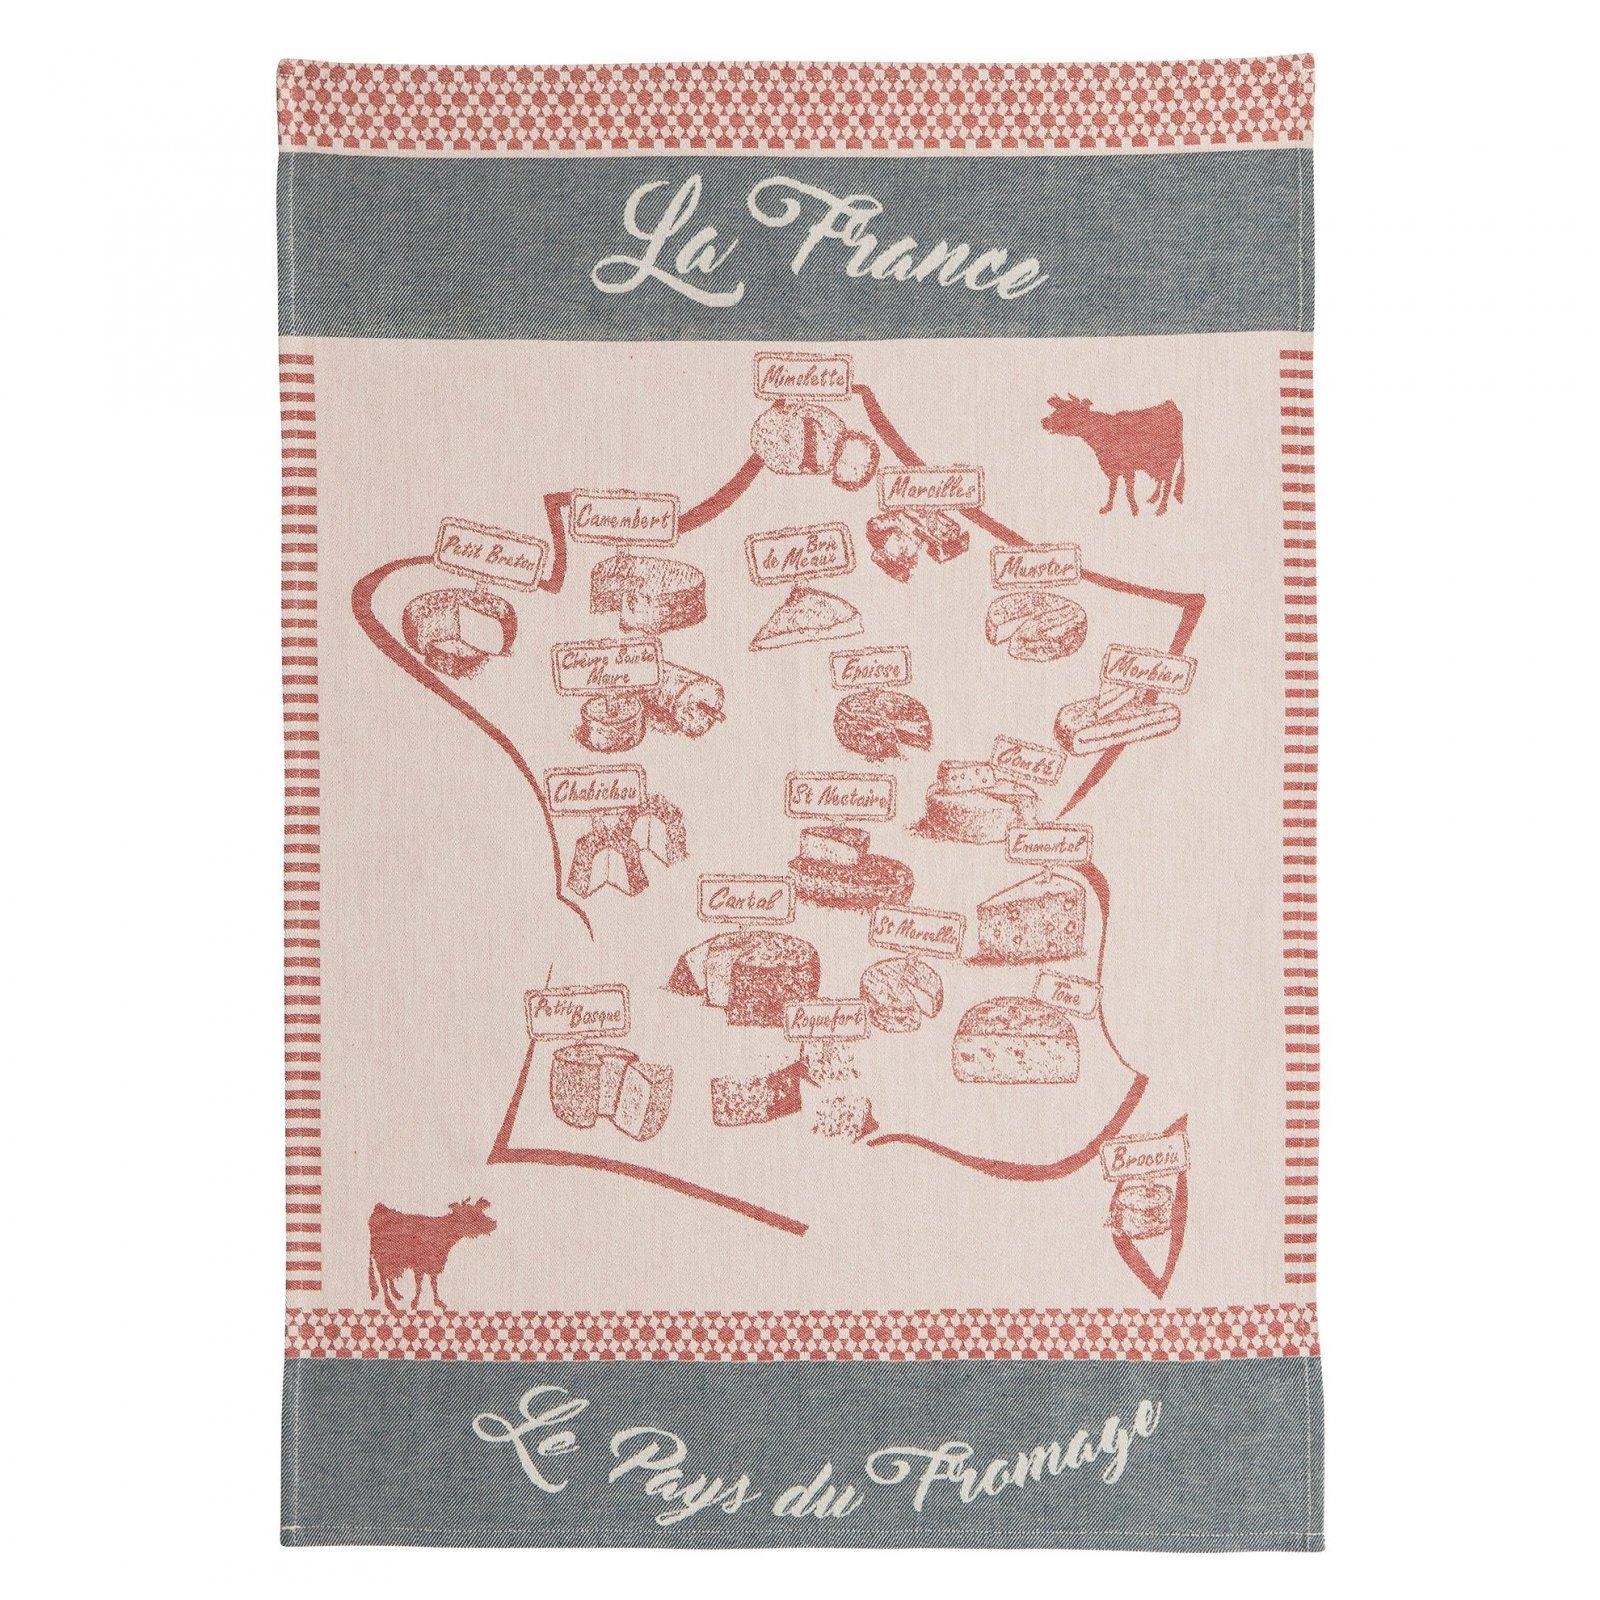 Coucke Carte Fromagere tea towel